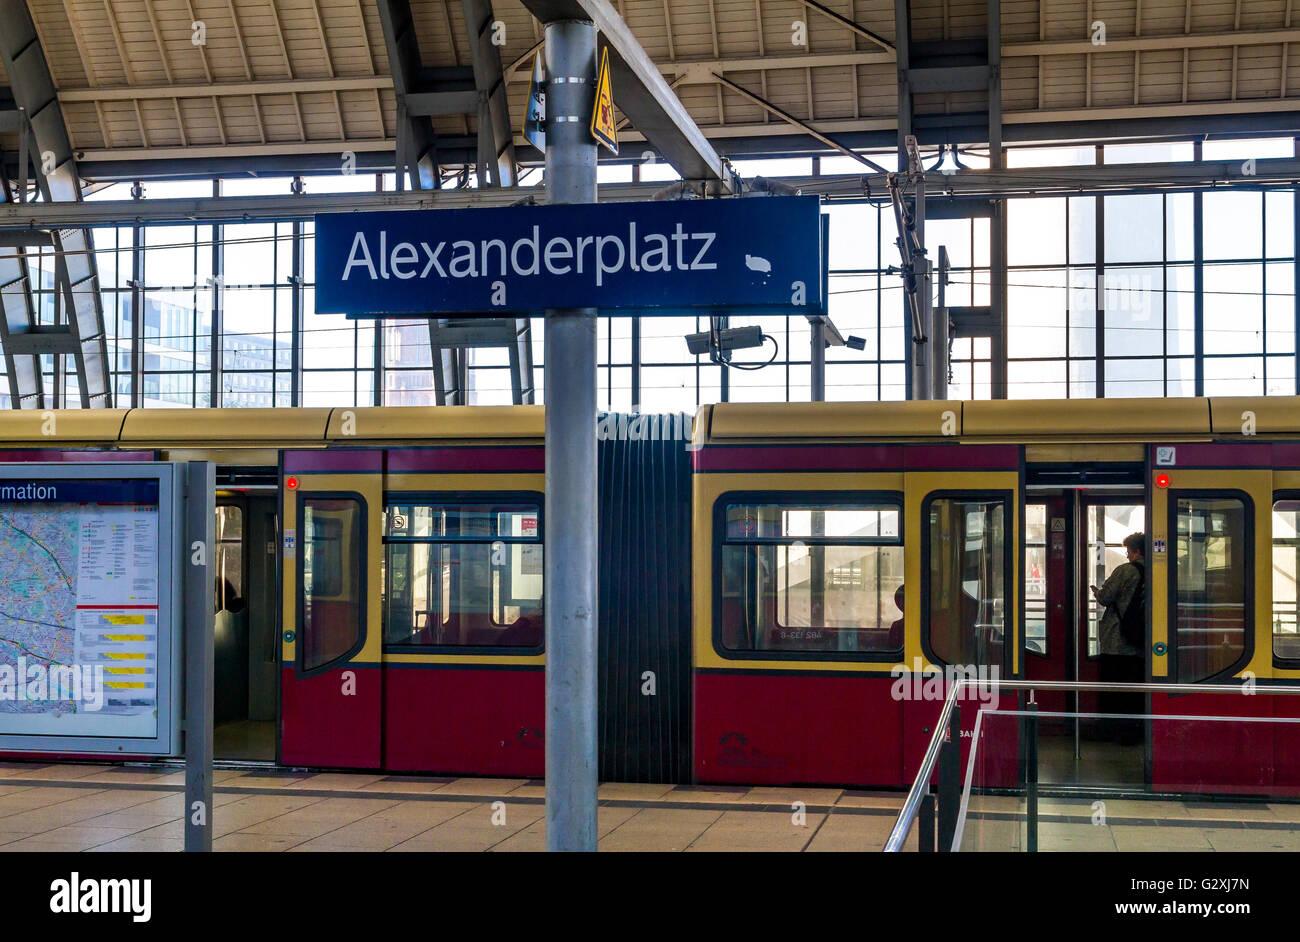 S Bahn train at Alexanderplatz Hauptbahnhof , Berlin ,Germany Stock Photo